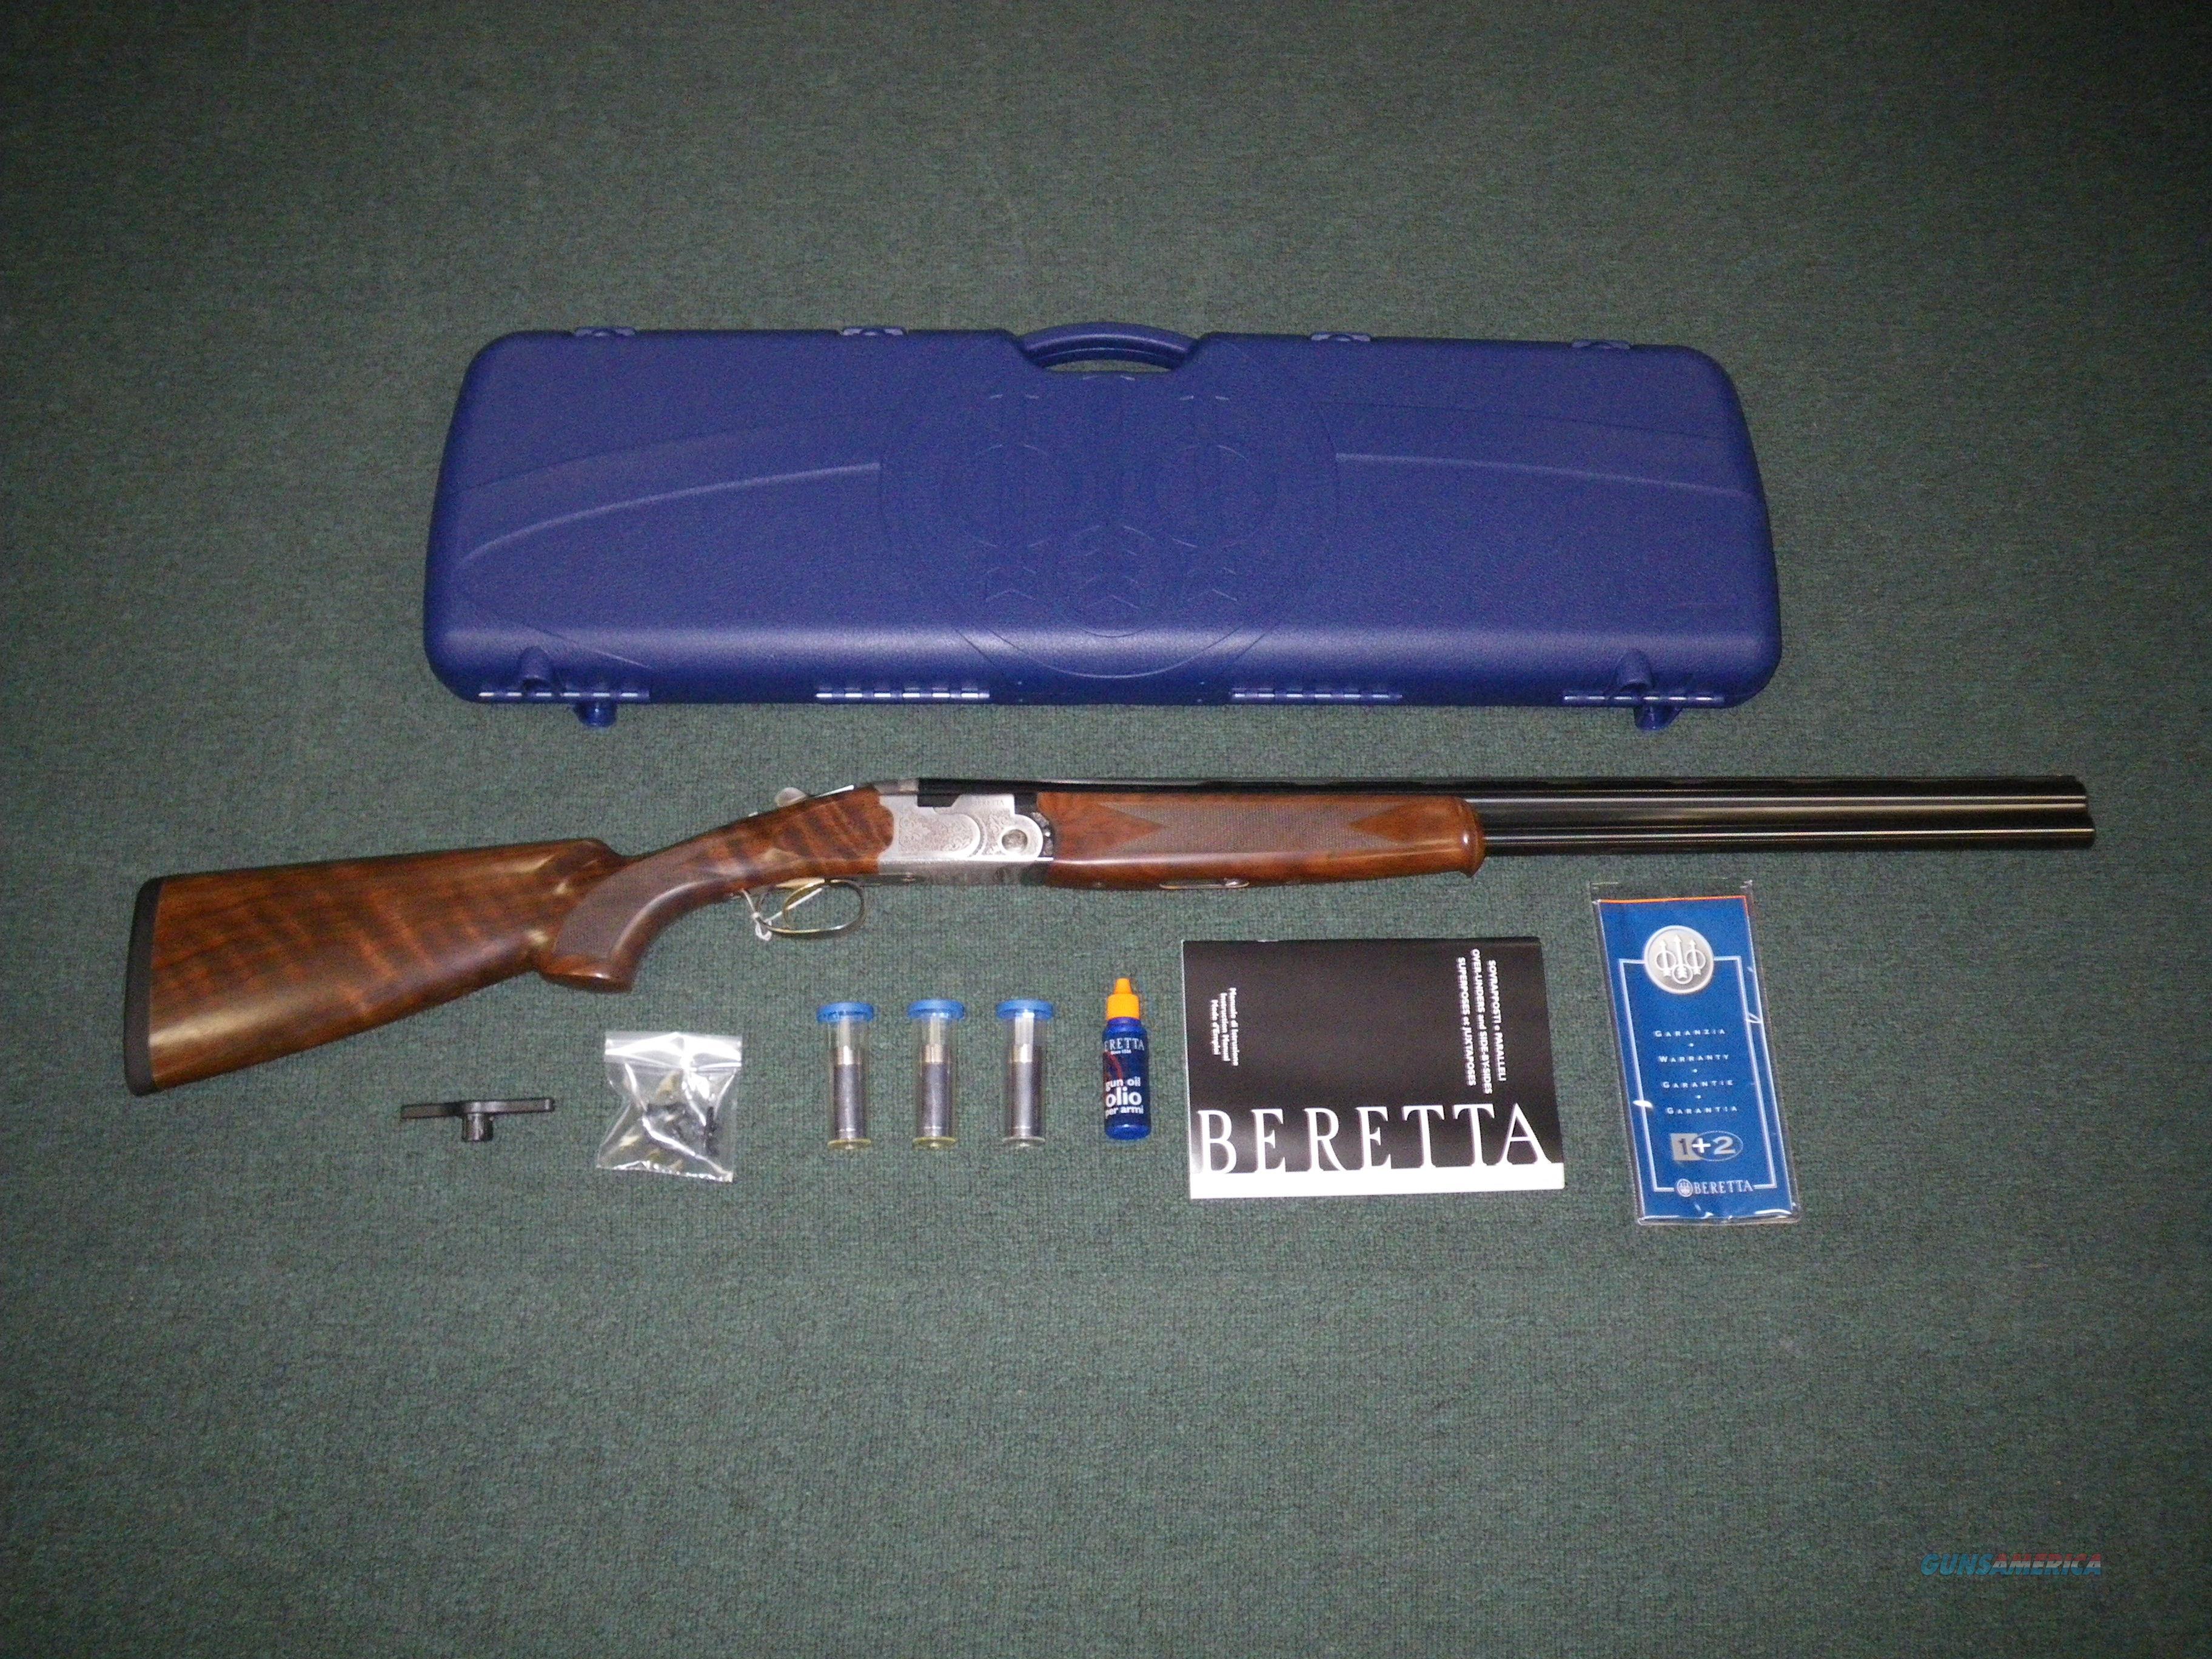 "Beretta 686 Silver Pigeon I 28ga 30"" Over Under J6863M0  Guns > Shotguns > Beretta Shotguns > O/U > Hunting"